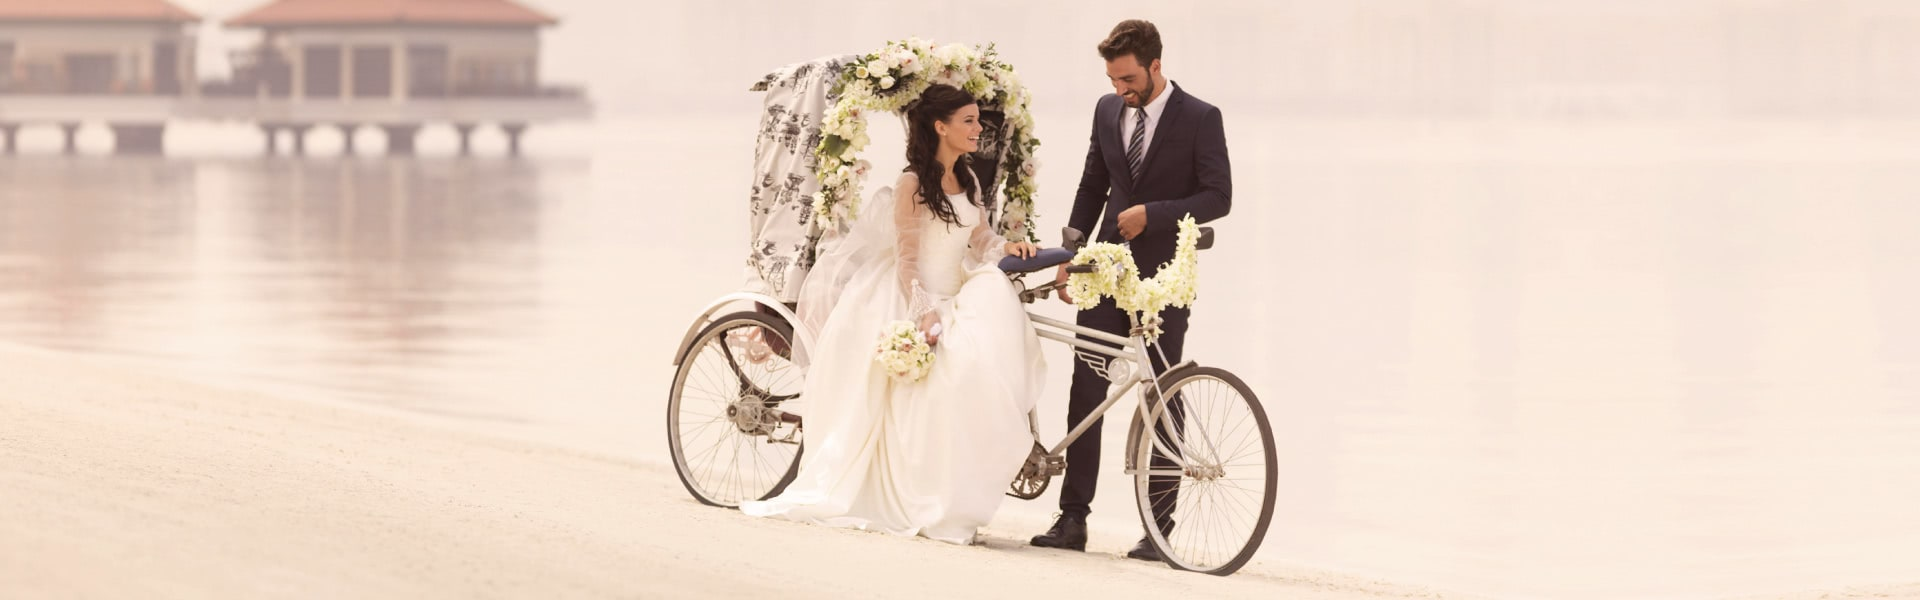 Dubai Wedding Venues Anantara The Palm Dubai Weddings